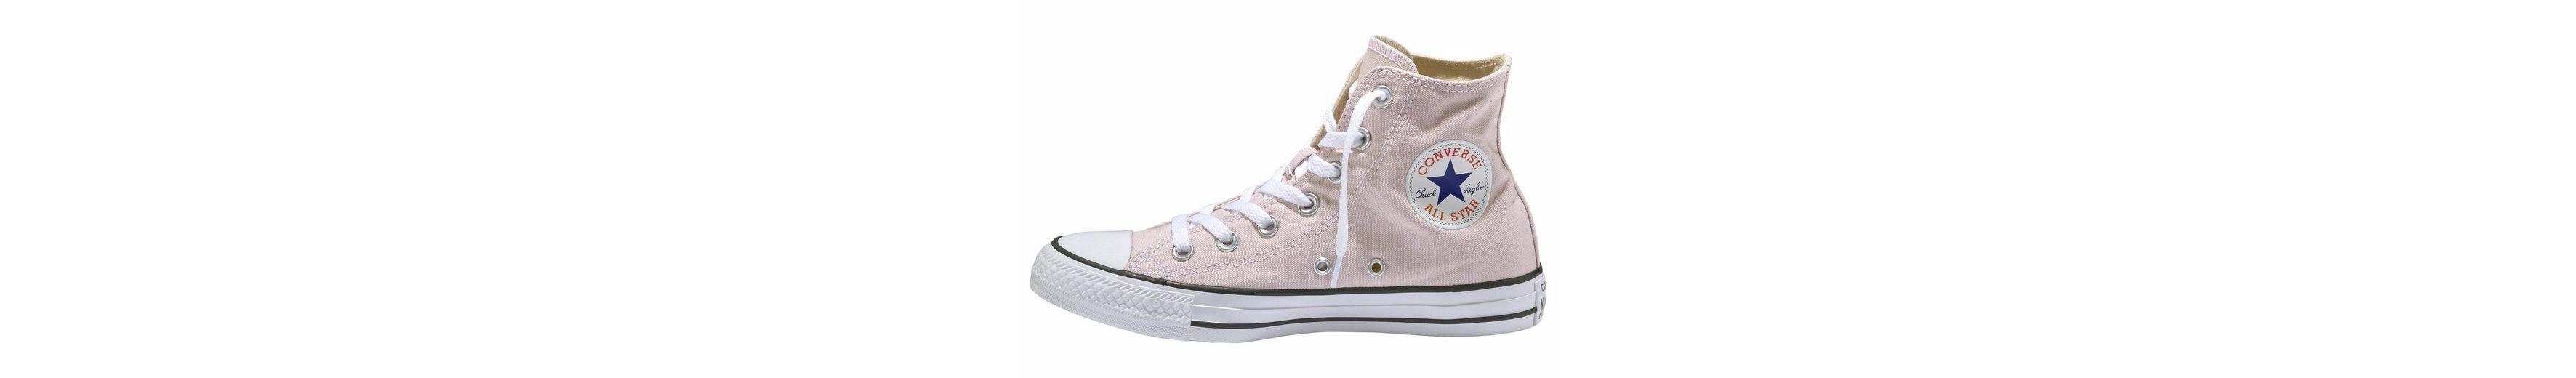 Converse Chuck Taylor All Star Hi Sneaker, Seasonal 1